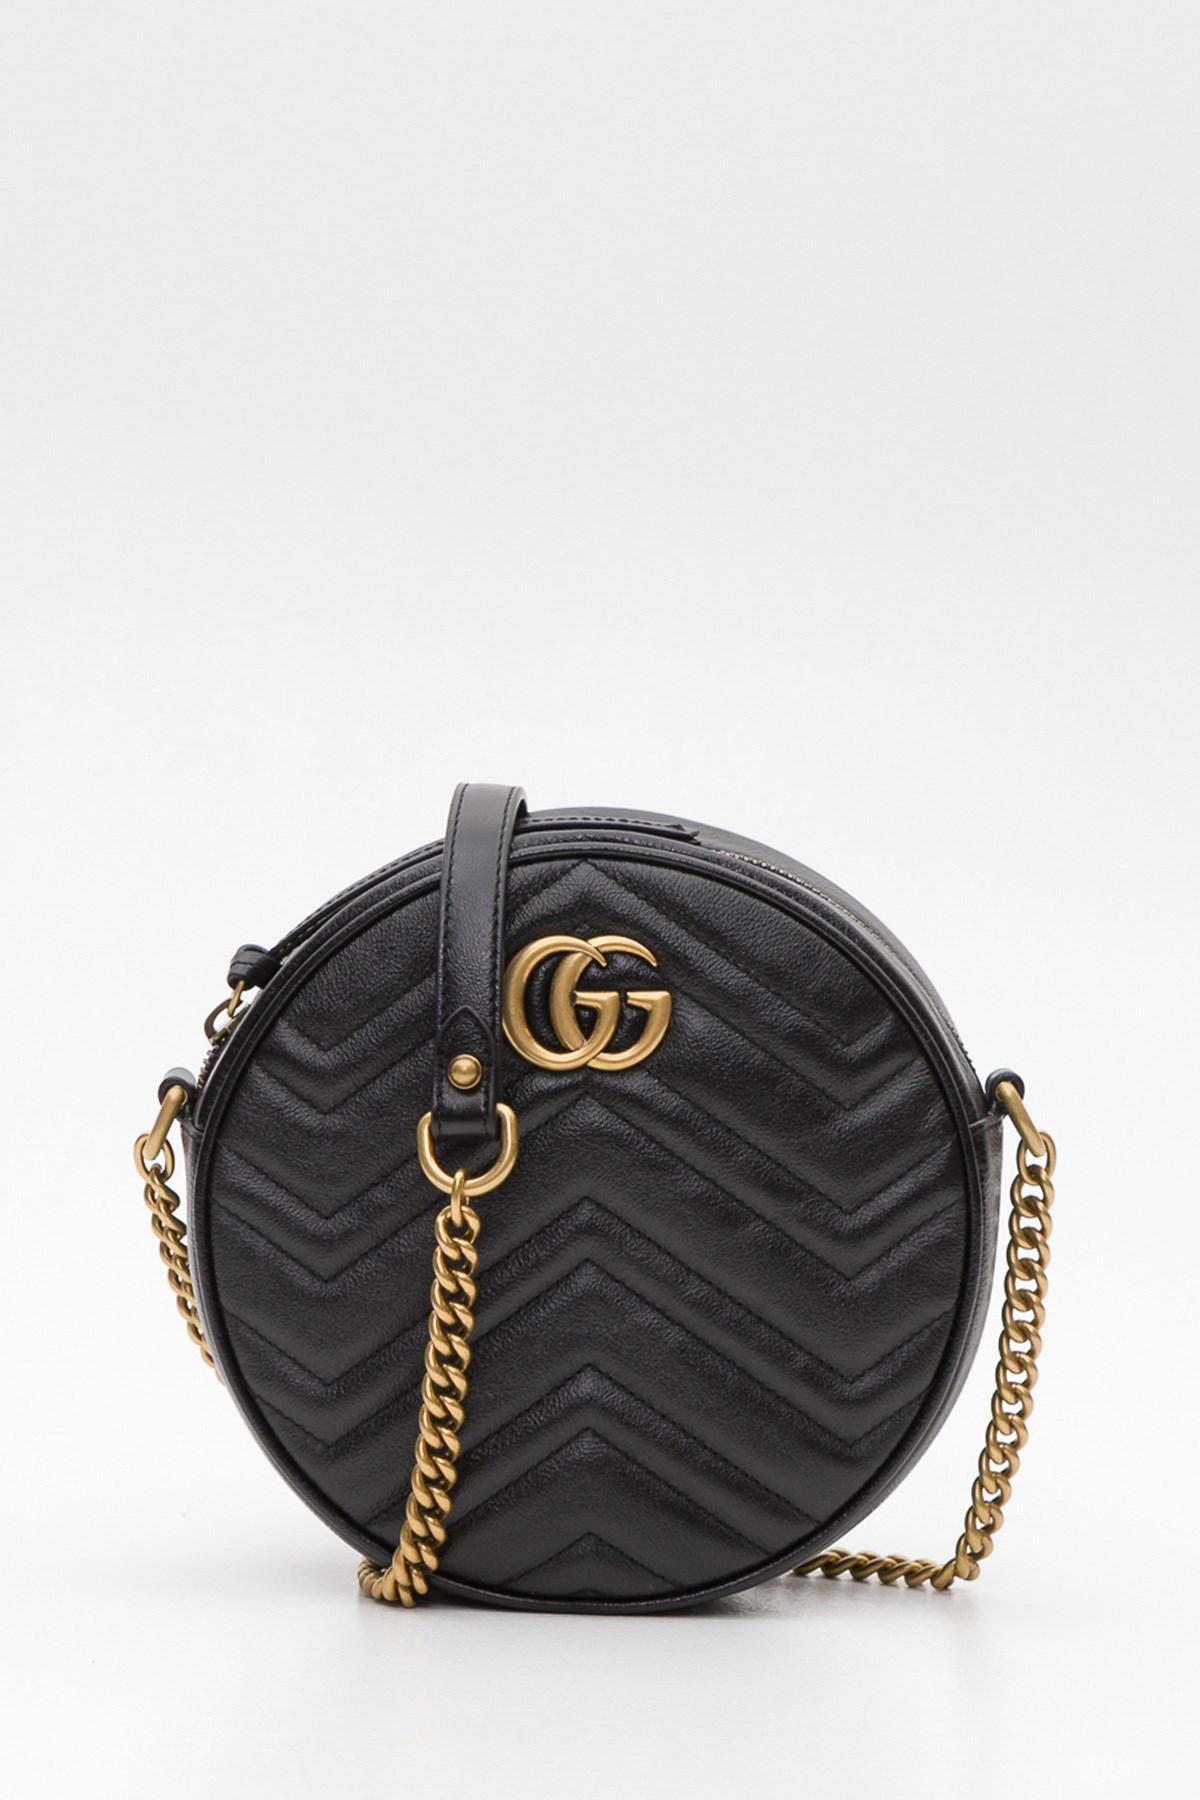 434463320a610b Gucci Gg Marmont Mini Round Shoulder Bag in Black - Lyst